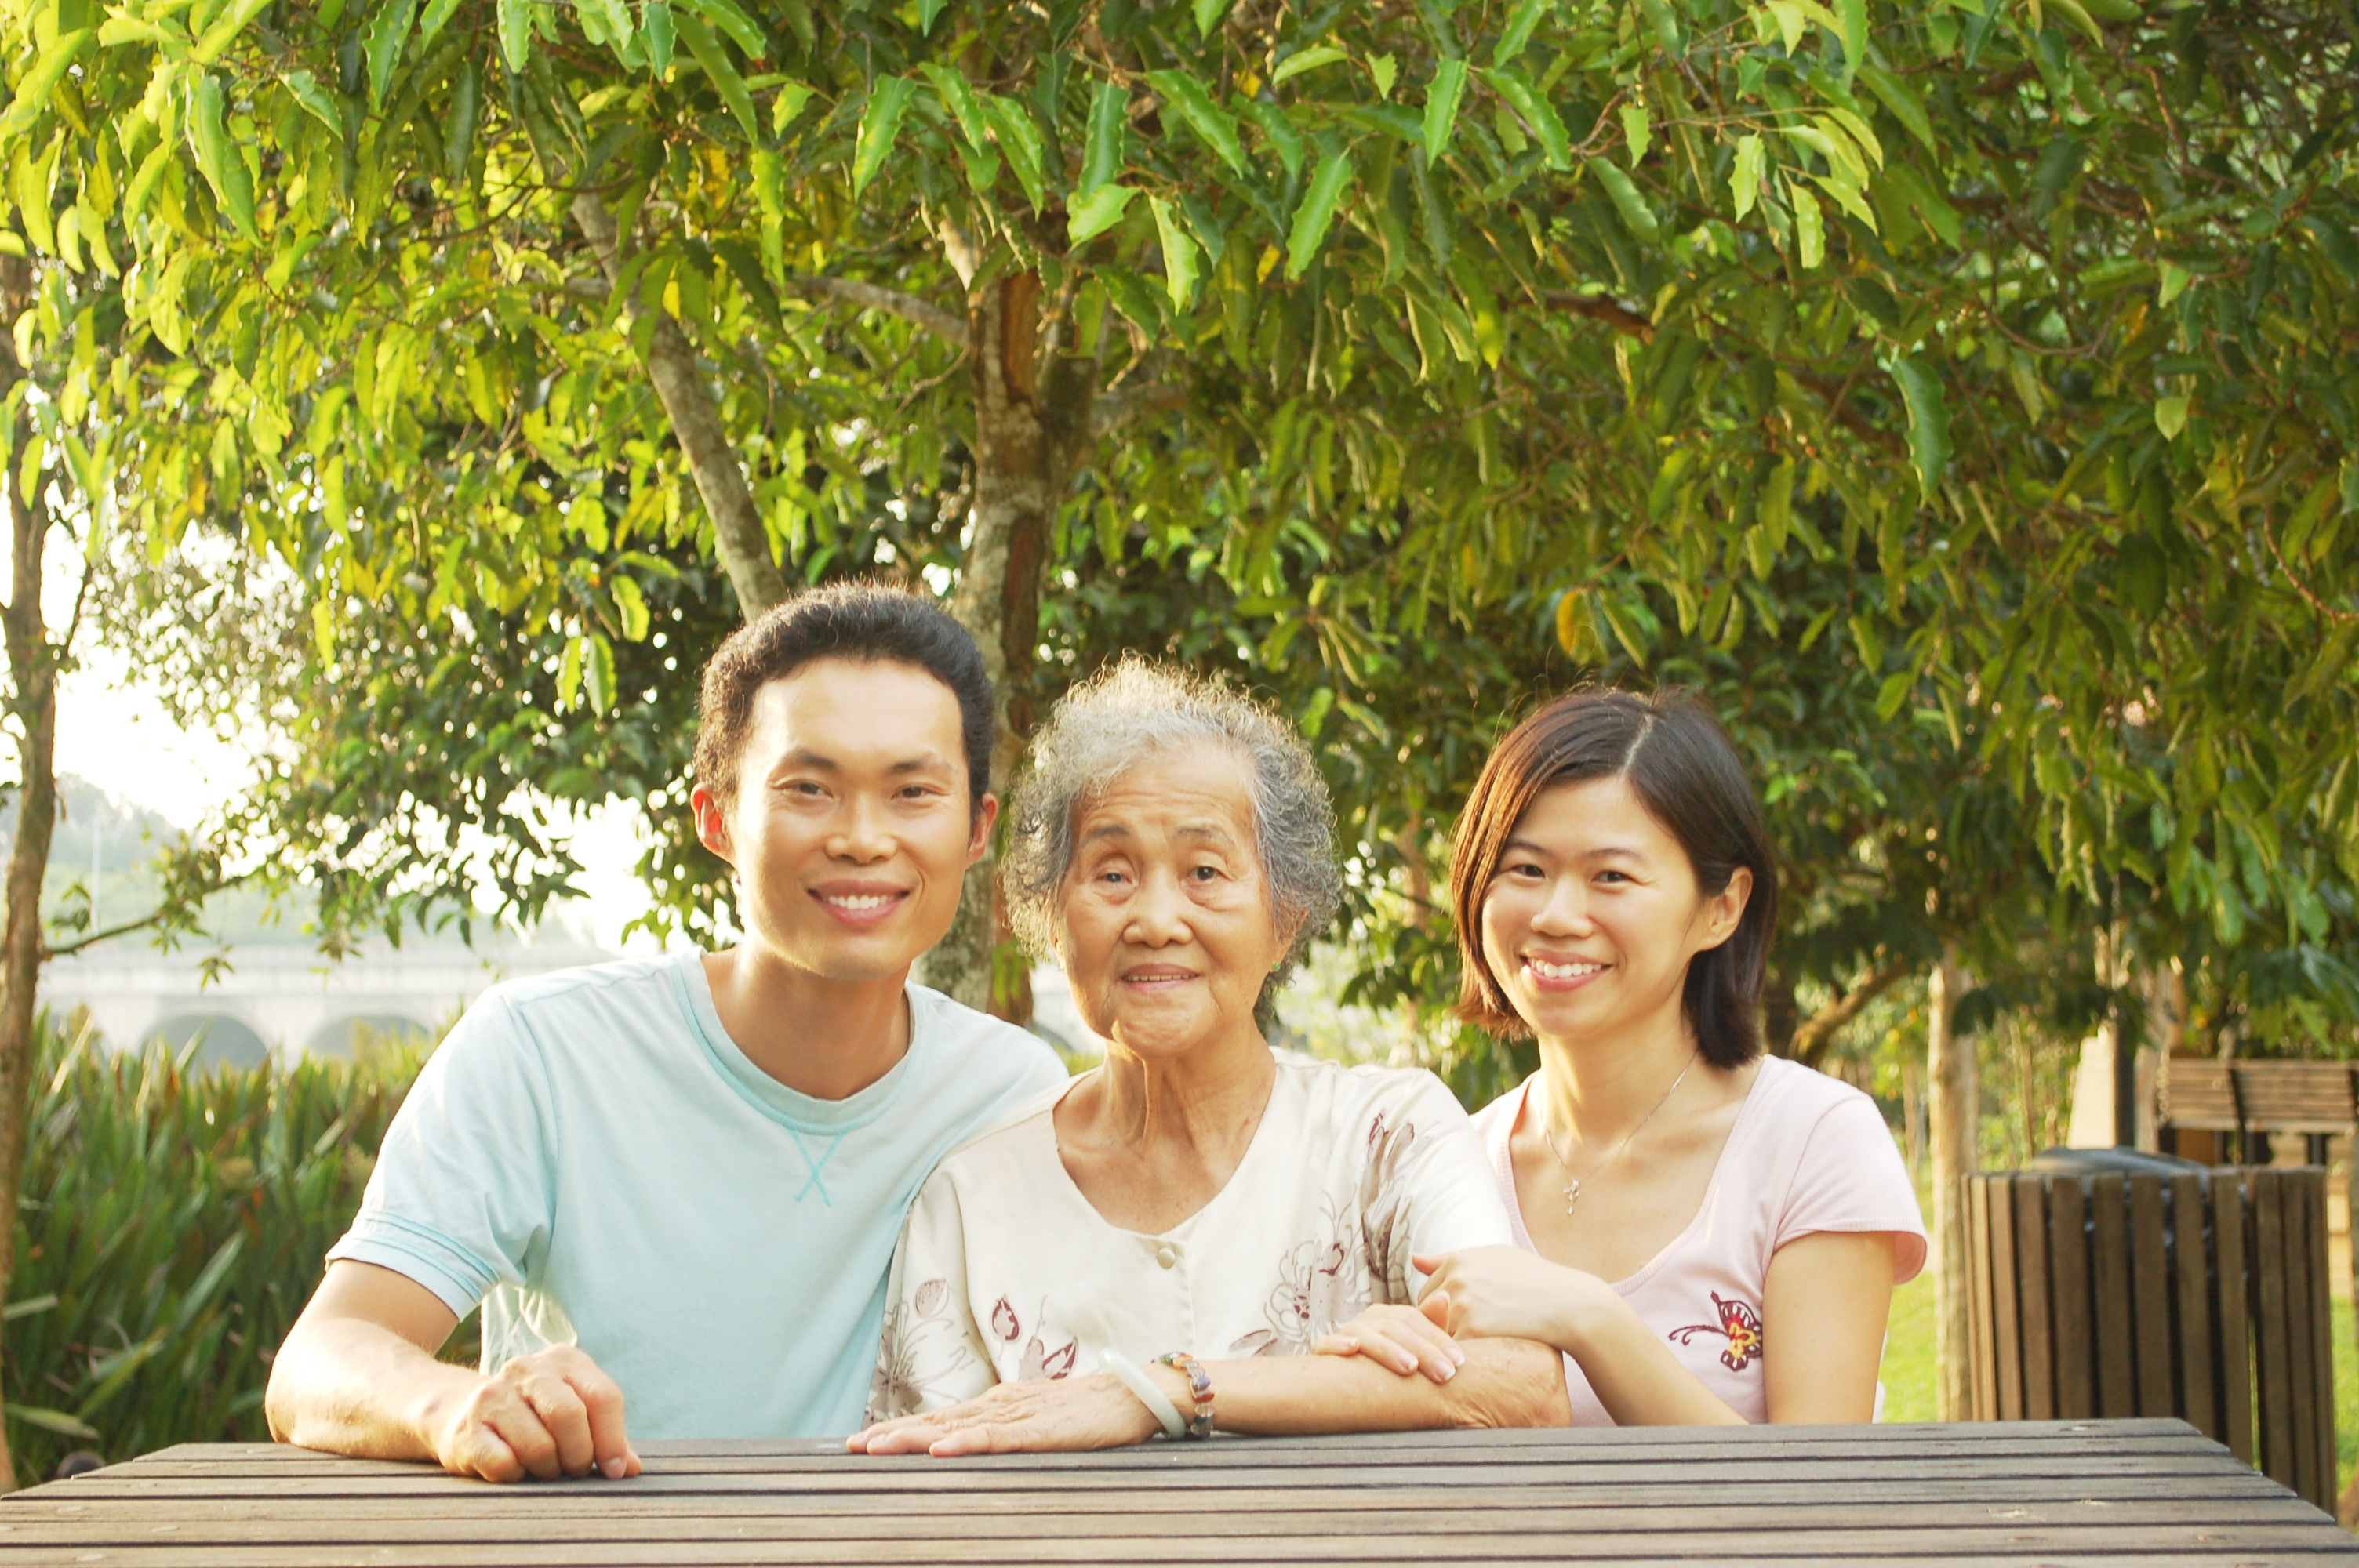 CaregiverAsia stories inspire Apple to embark on her caregiving journey